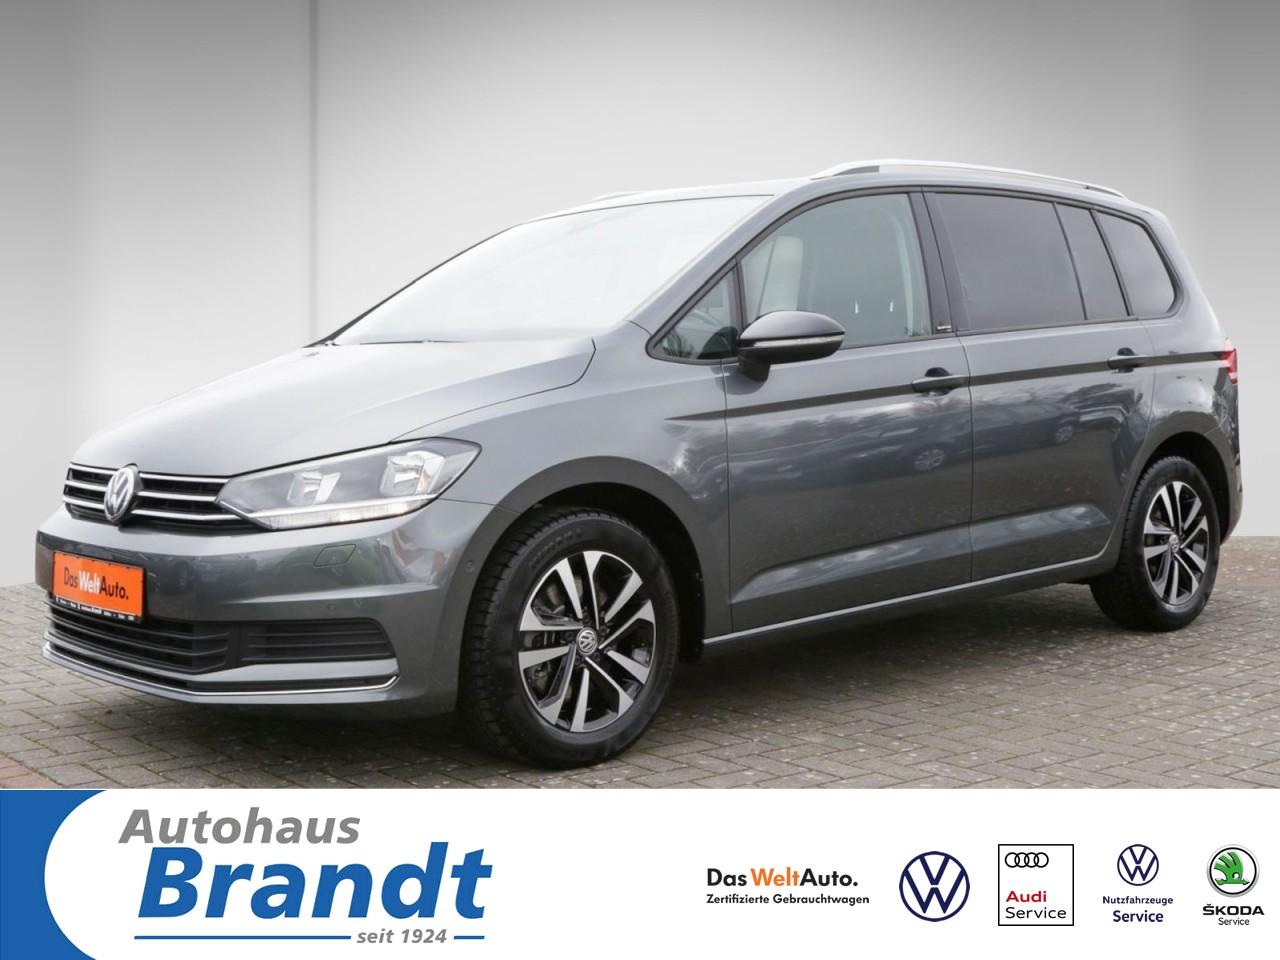 Volkswagen Touran 2.0 TDI IQ.DRIVE DSG*NAVI*ACC*7-SITZER*AHK, Jahr 2020, Diesel